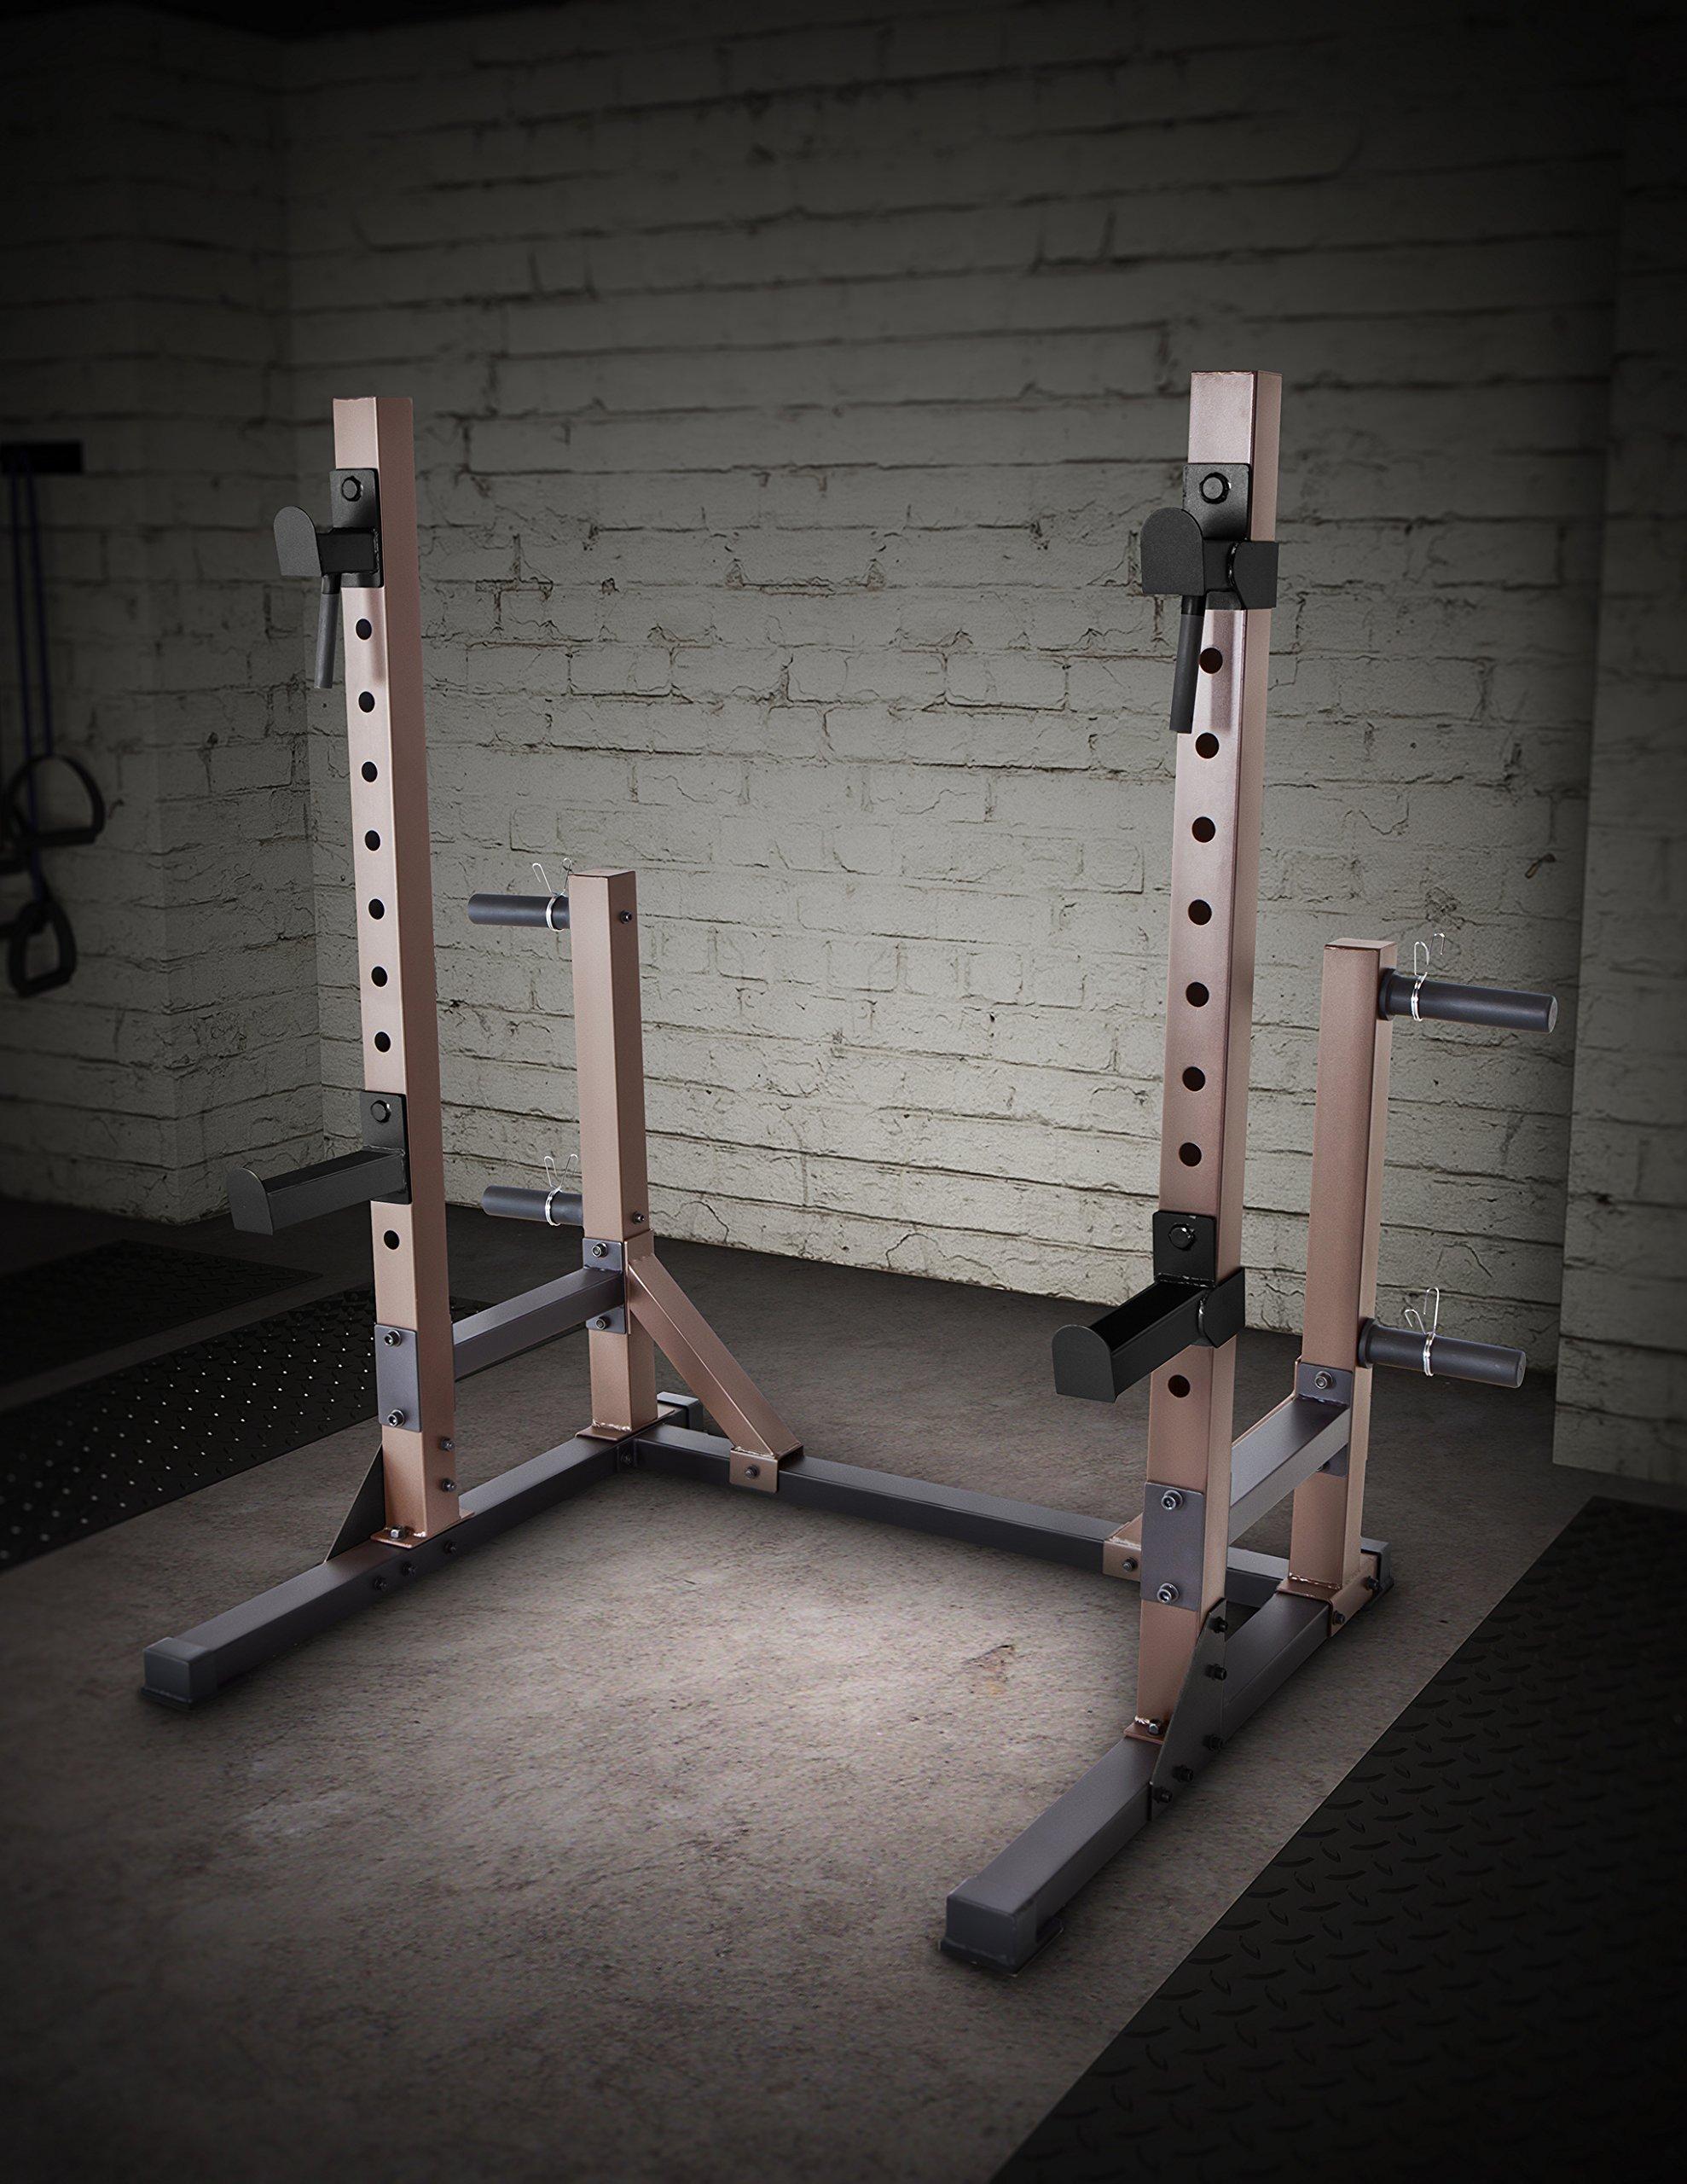 Steelbody Squat Rack STB-70105 by Steelbody (Image #2)